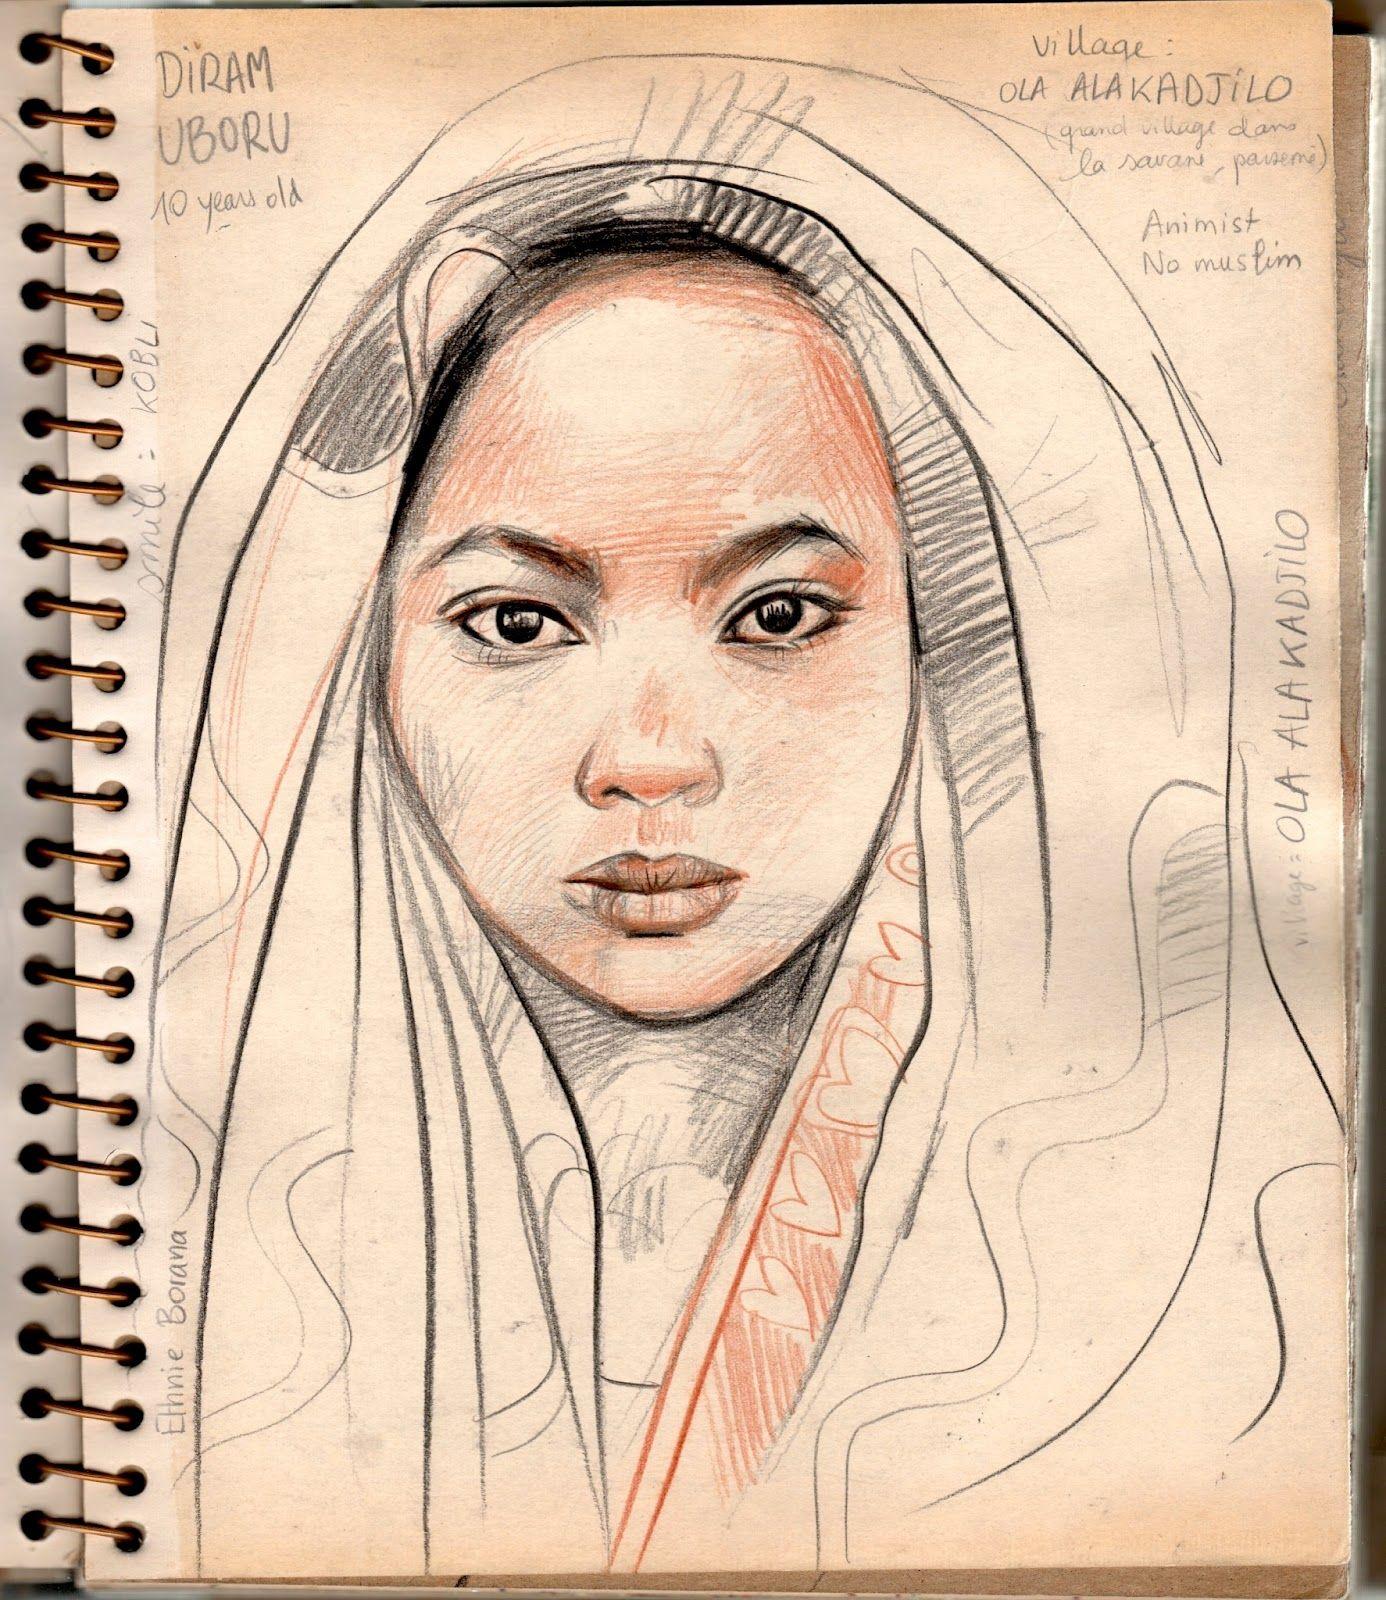 Stéphanie Ledoux - Carnets de voyage: Diram Uboru